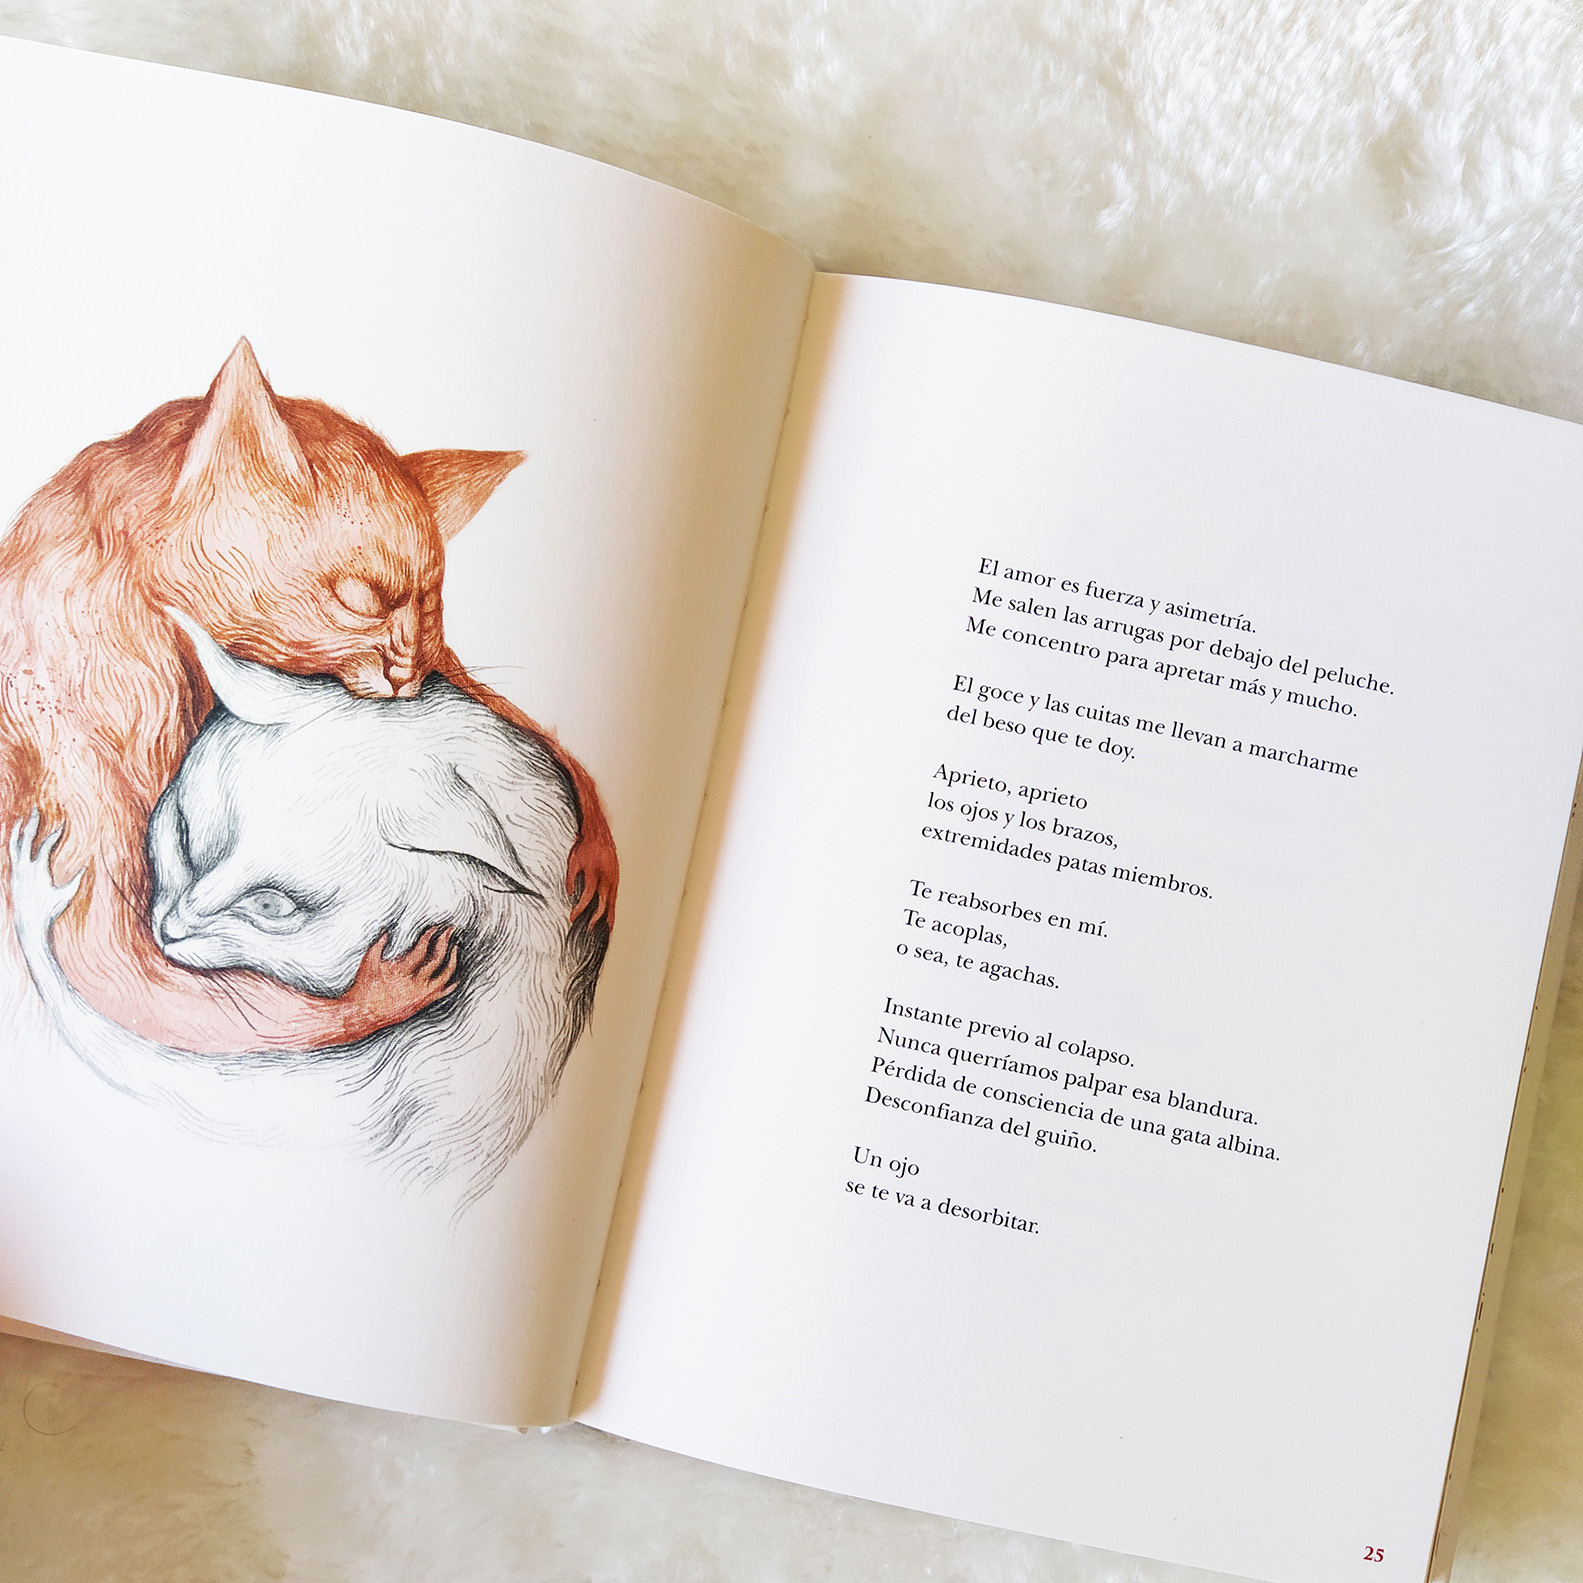 La vida secreta de los gatos (Marta Sanz y Ana Juan, 2020)